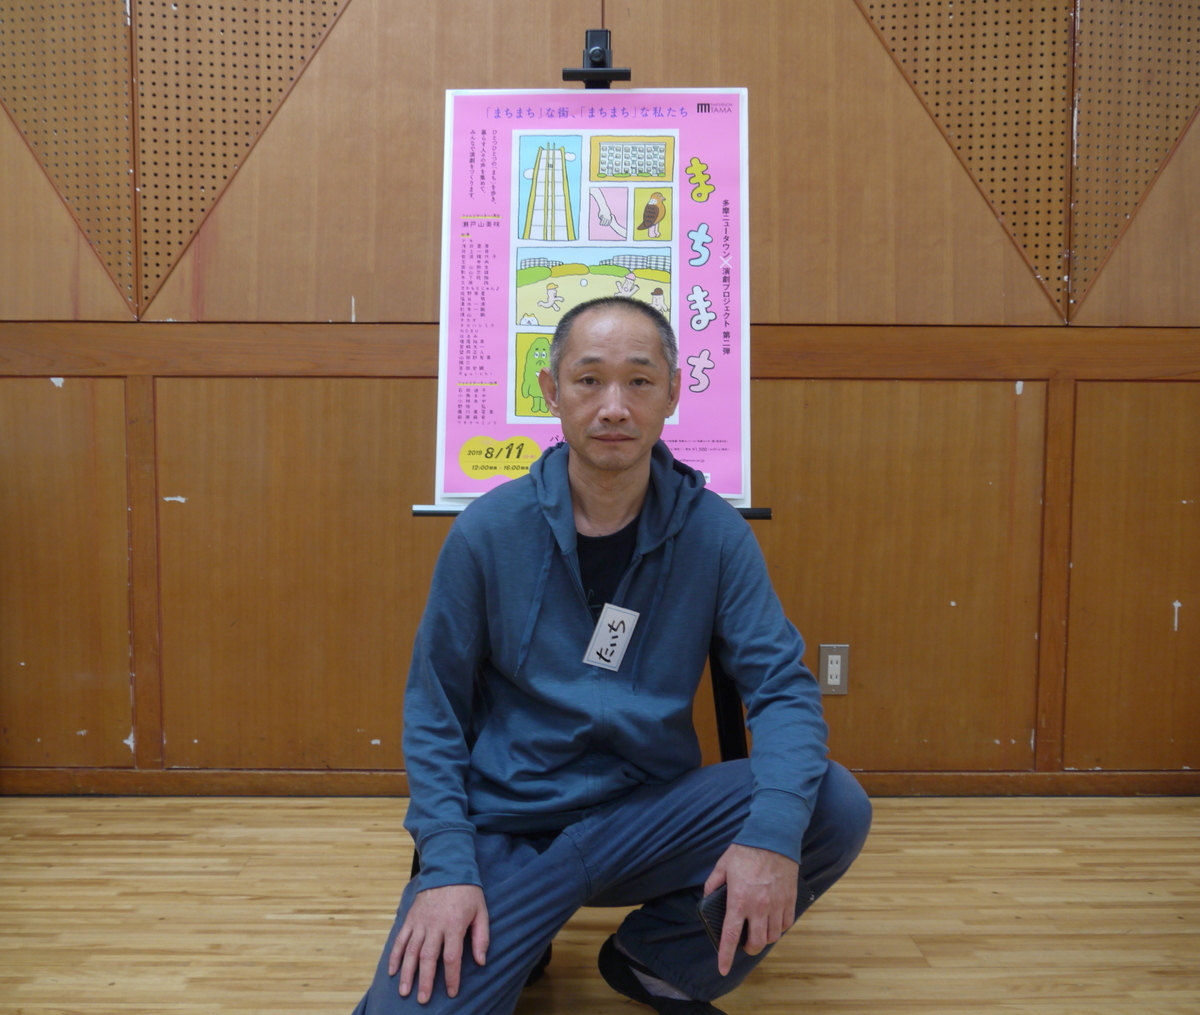 f:id:tamatamatama2017:20190806234751j:plain